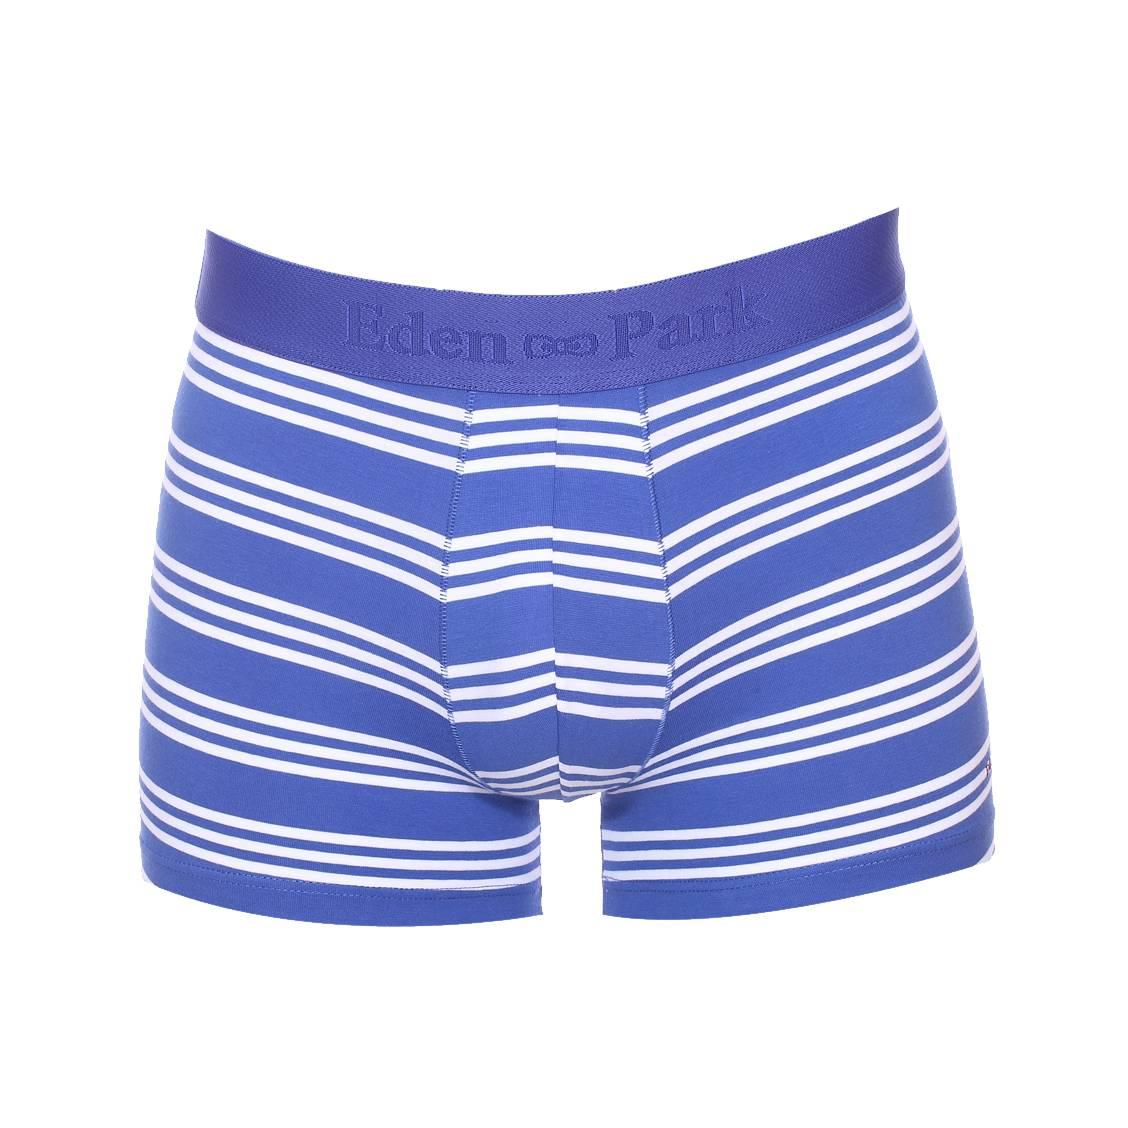 Boxer long  en coton stretch bleu roi à rayures blanches